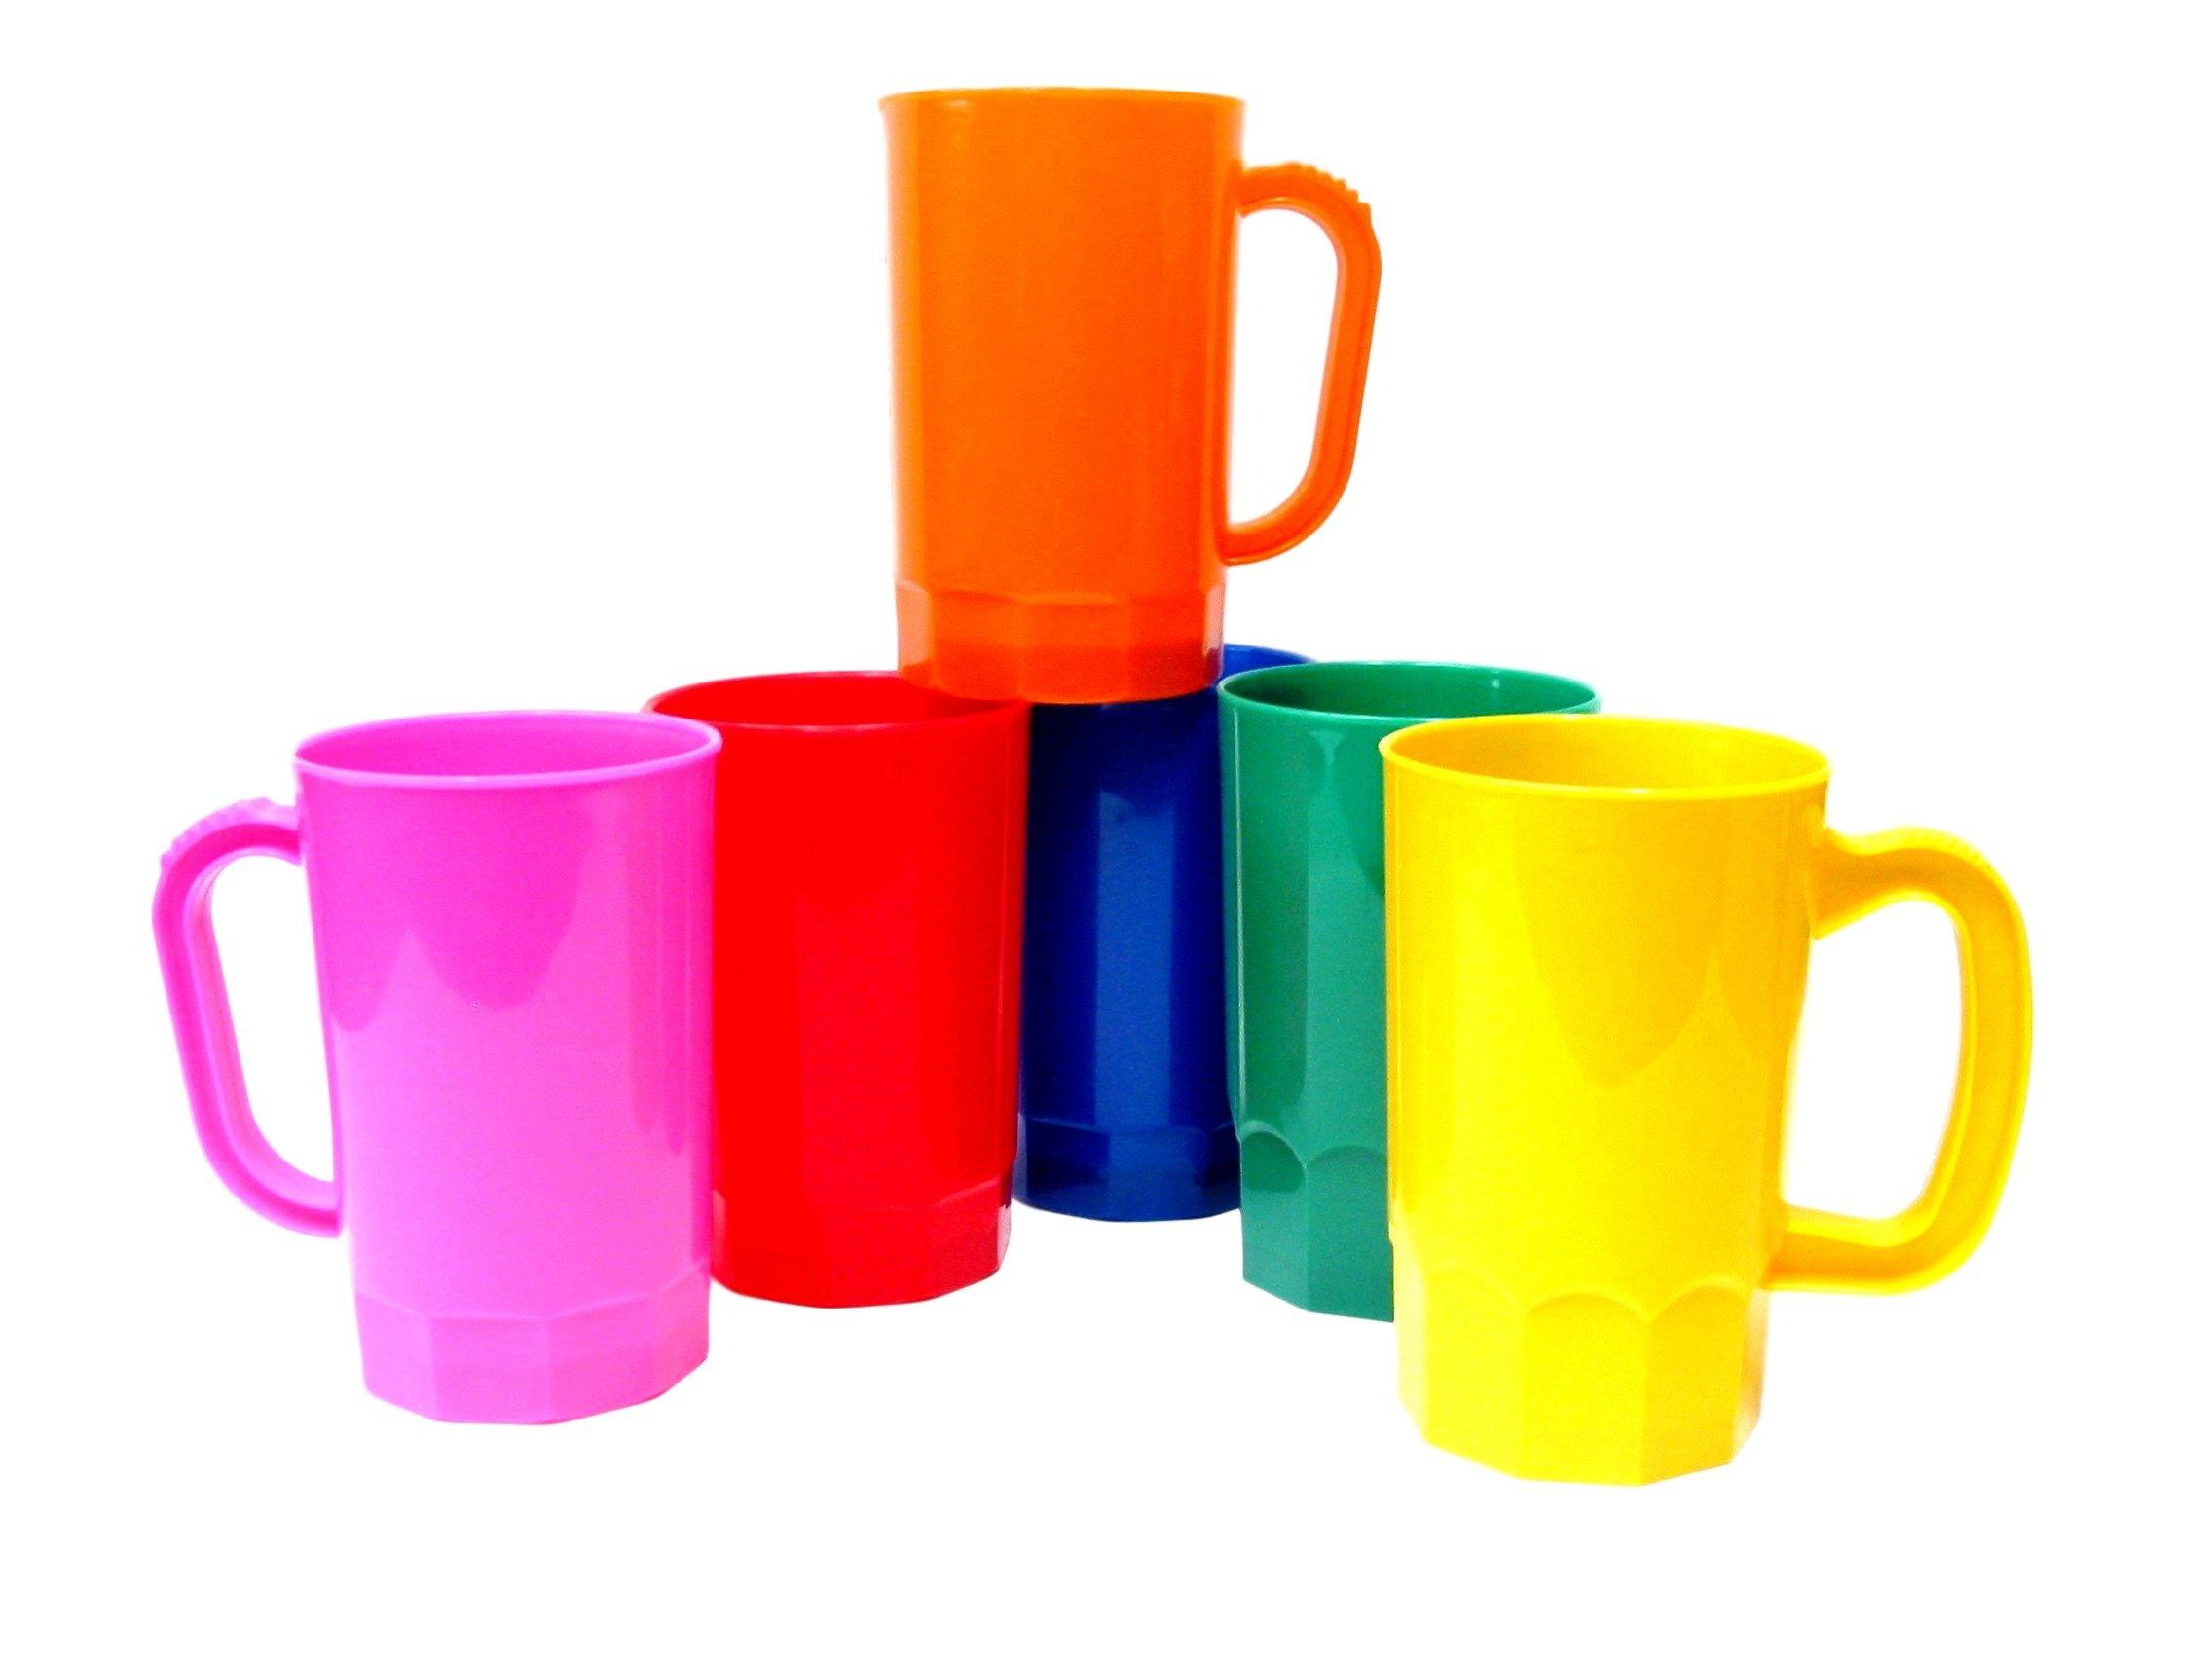 Talisman, Plastic Beer Mugs, Large 32 Ounce, Pack 6, Color Multi